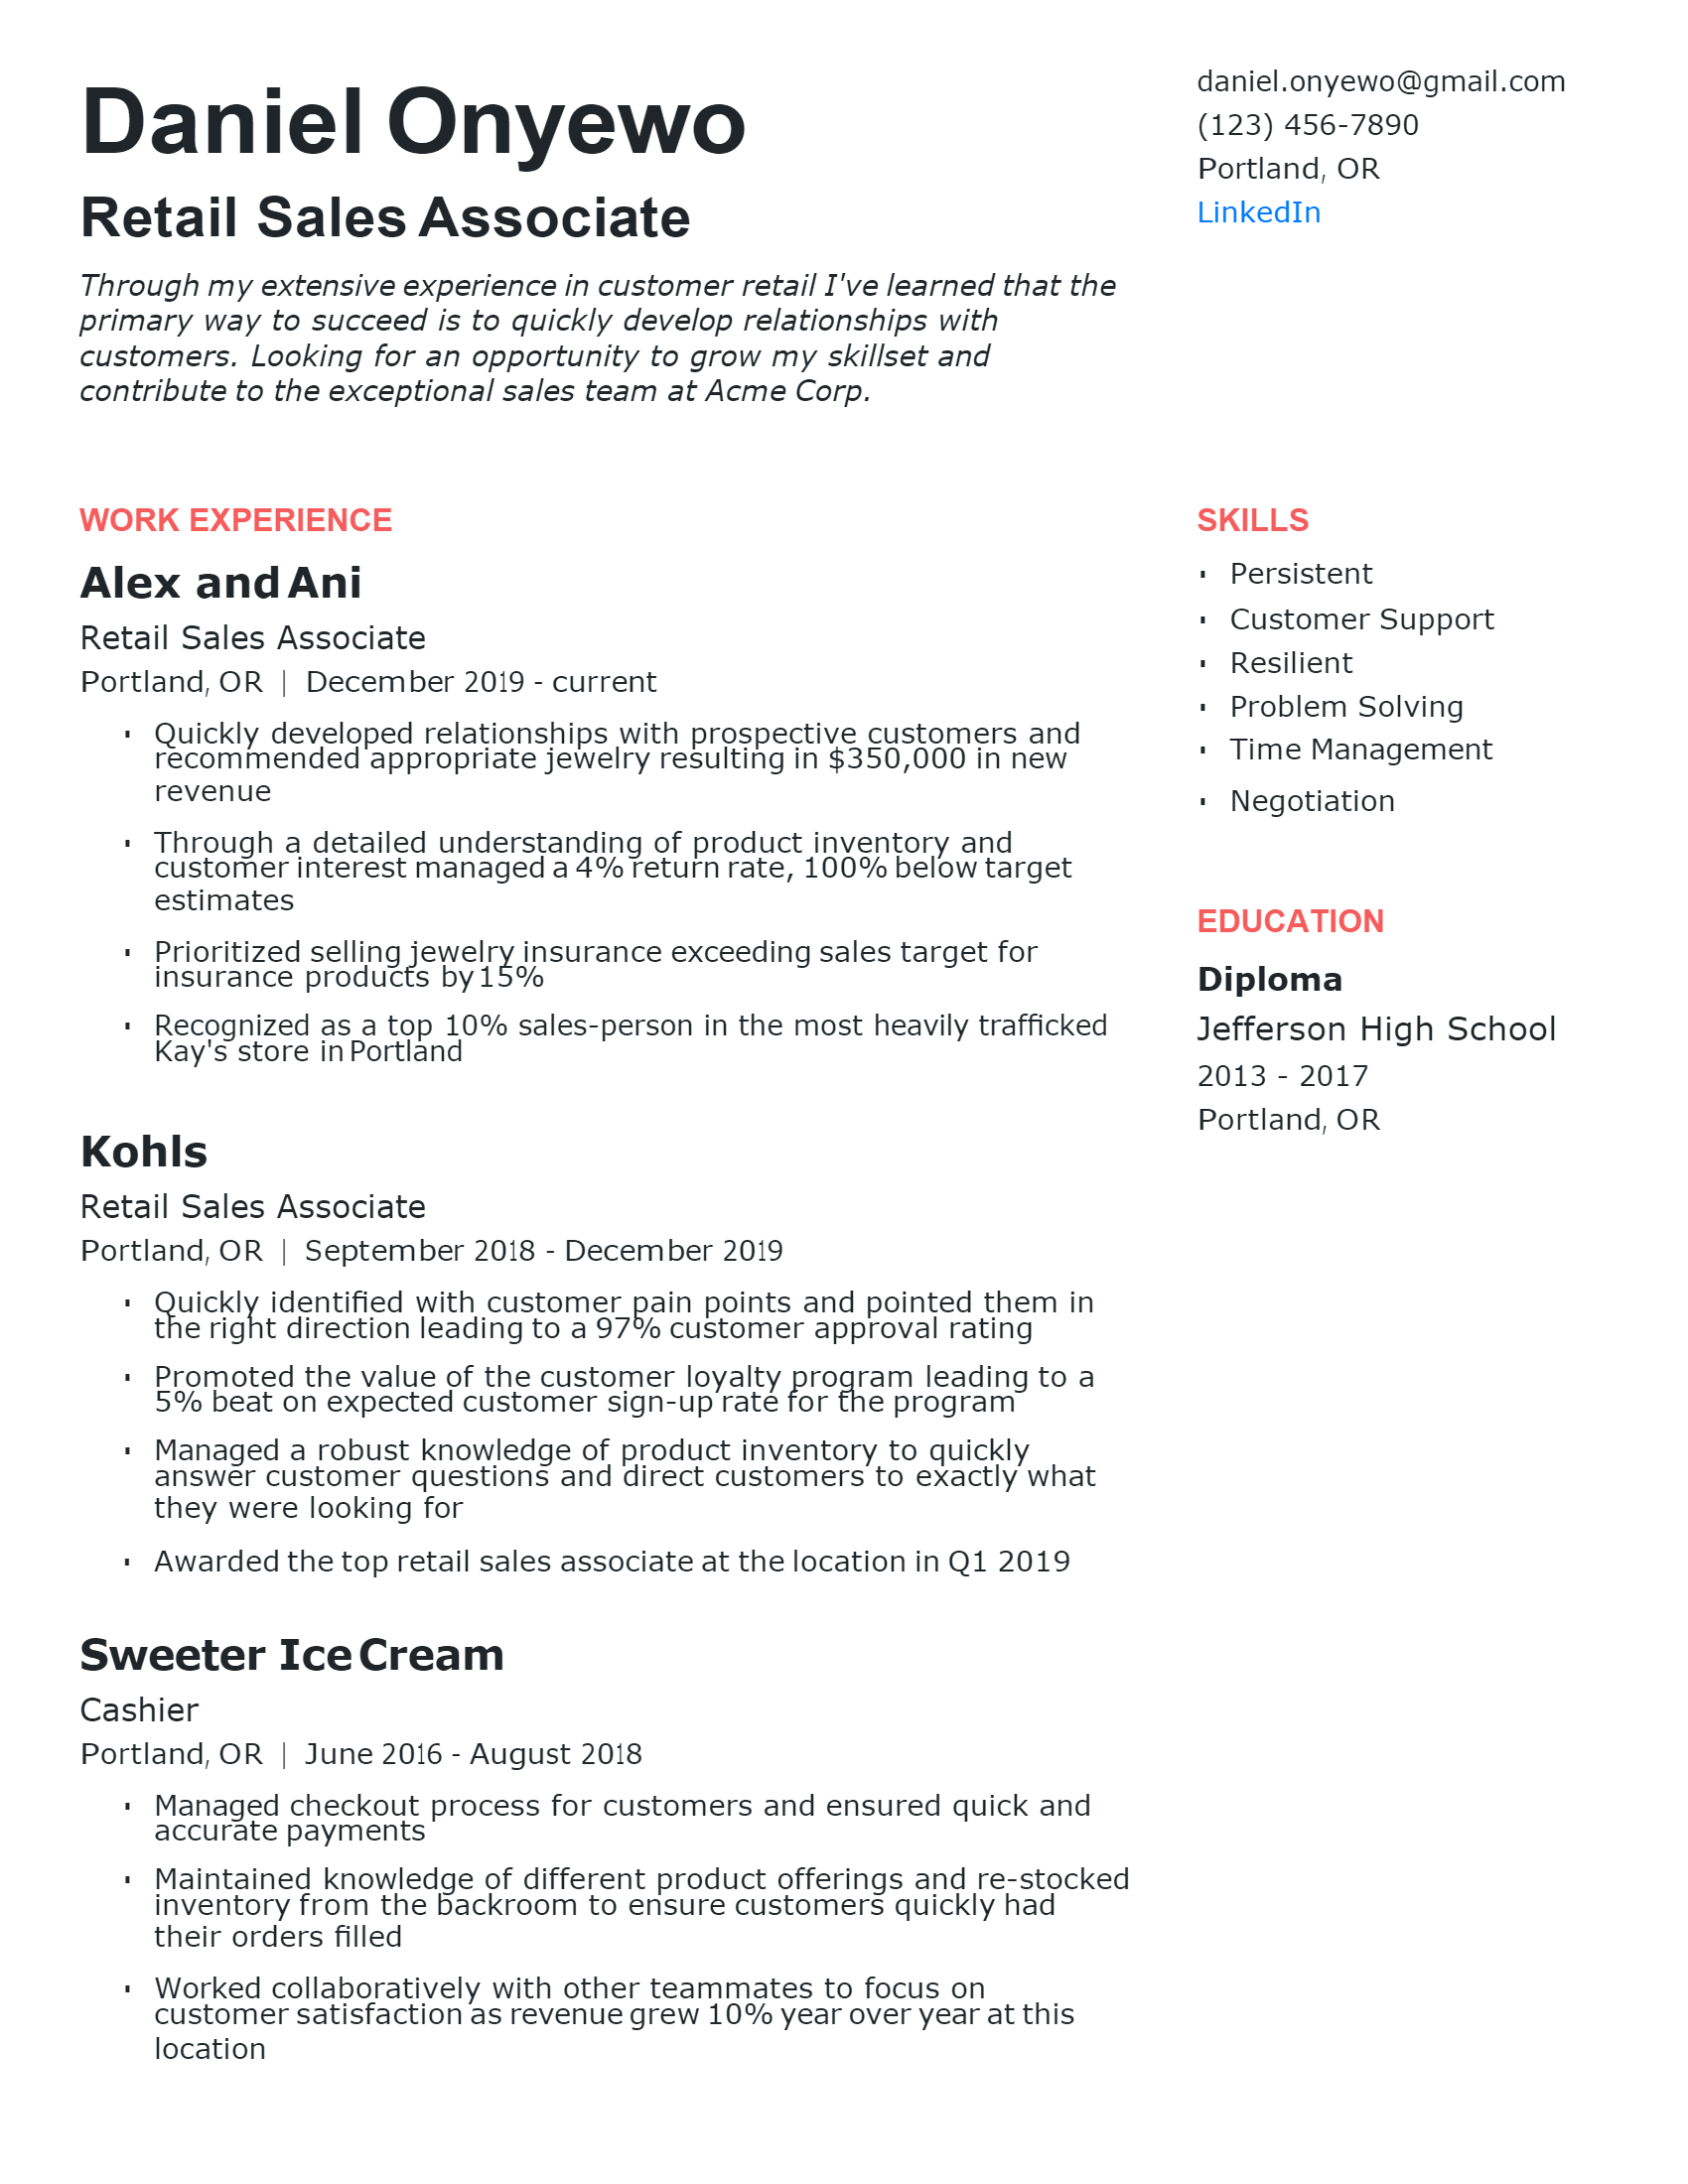 Retail Sales Associate Resume